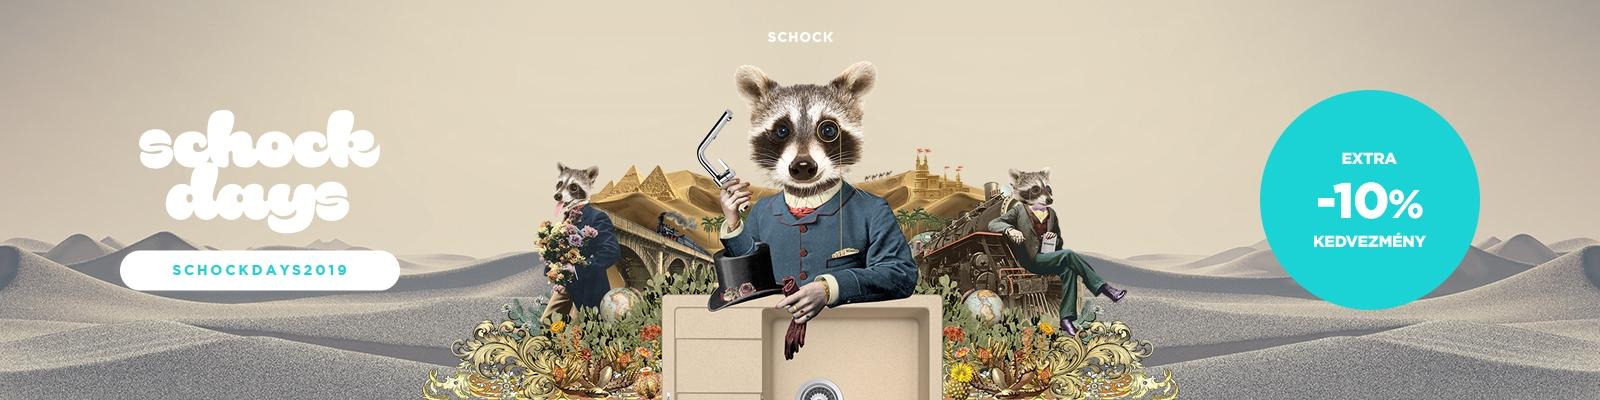 SCHOCK Days - Extra -10% Kedvezmény